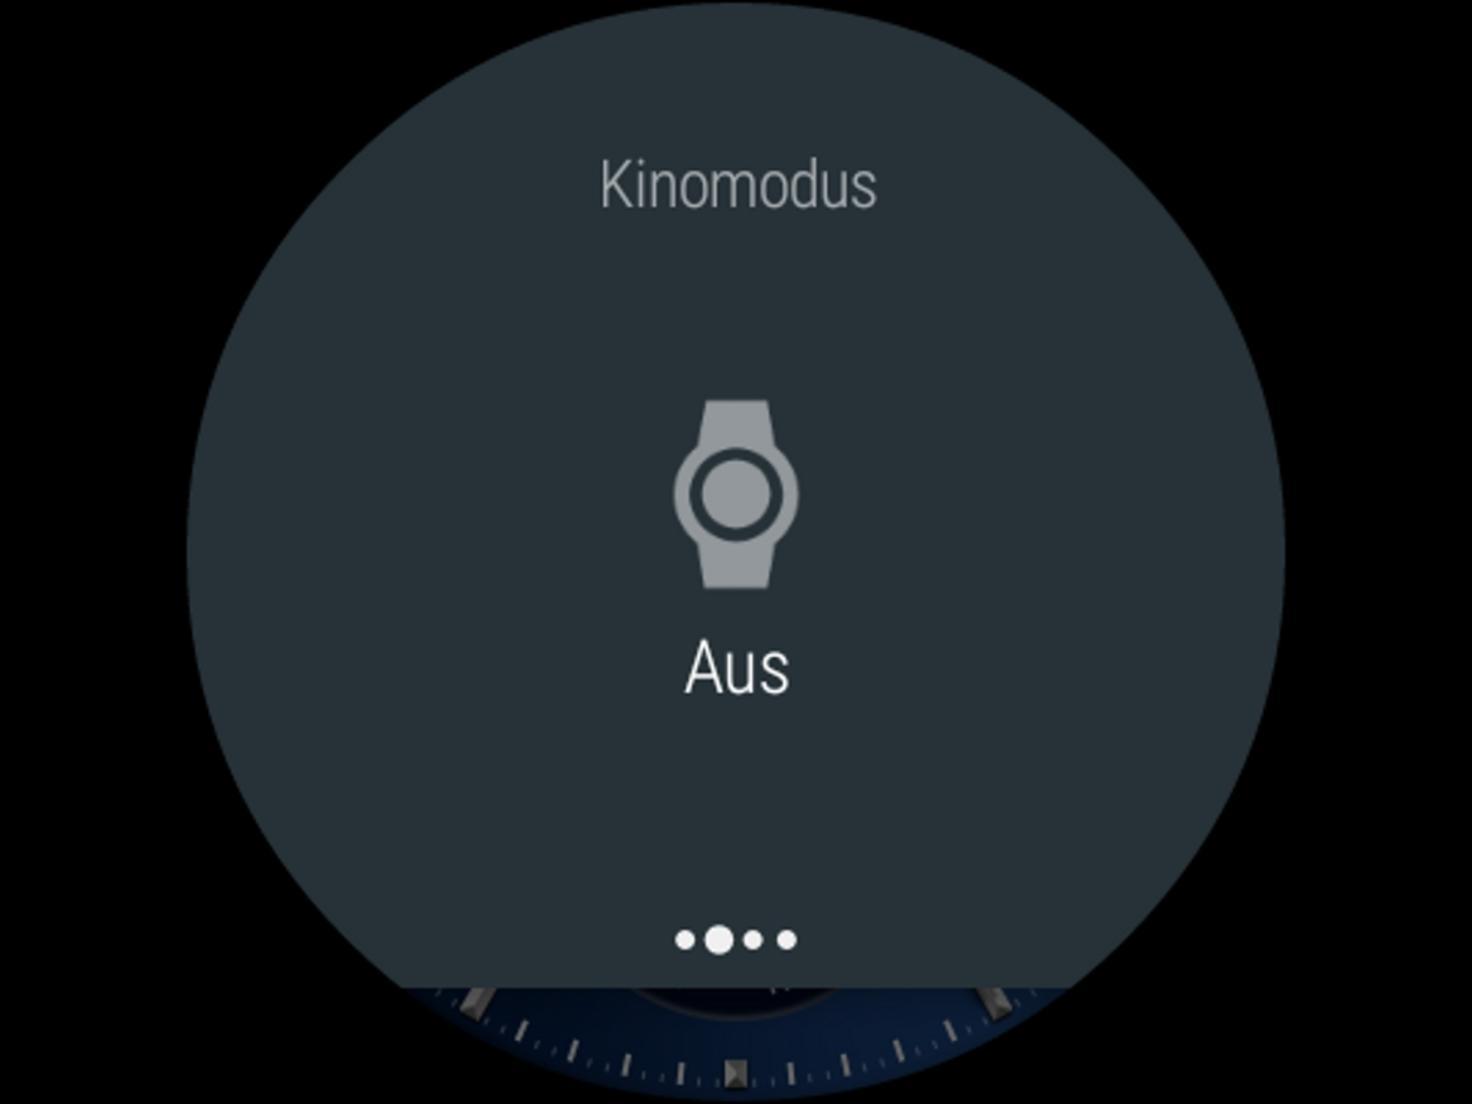 Android Wear Kinomodus